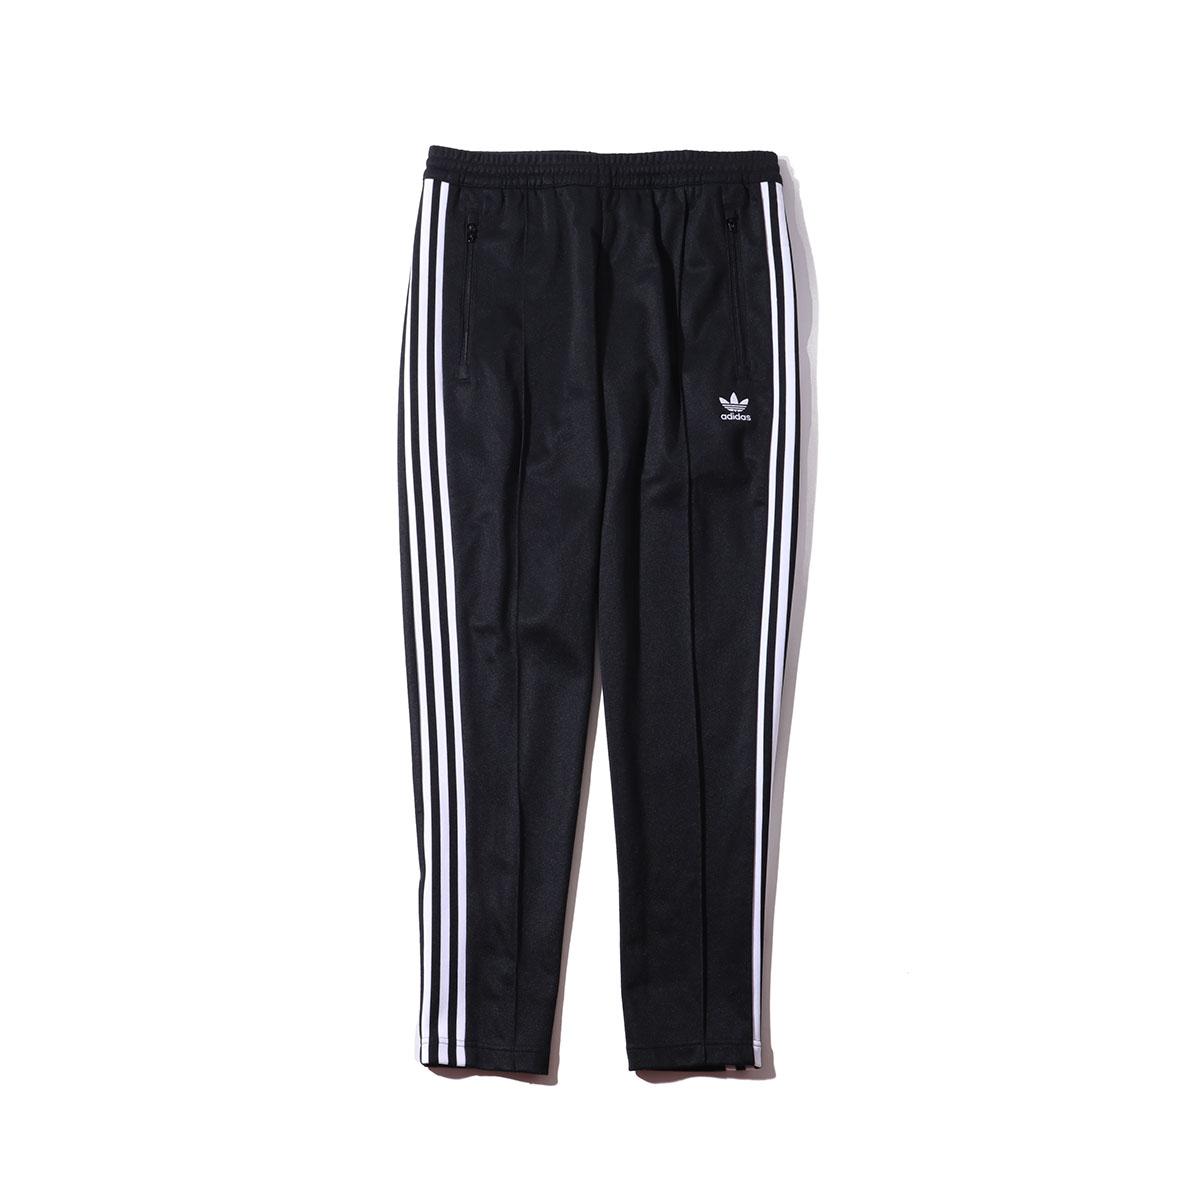 adidas Originals BECKENBAUER TRACK PANTS (Black) (Adidas originals Beckenbauer trackpants)